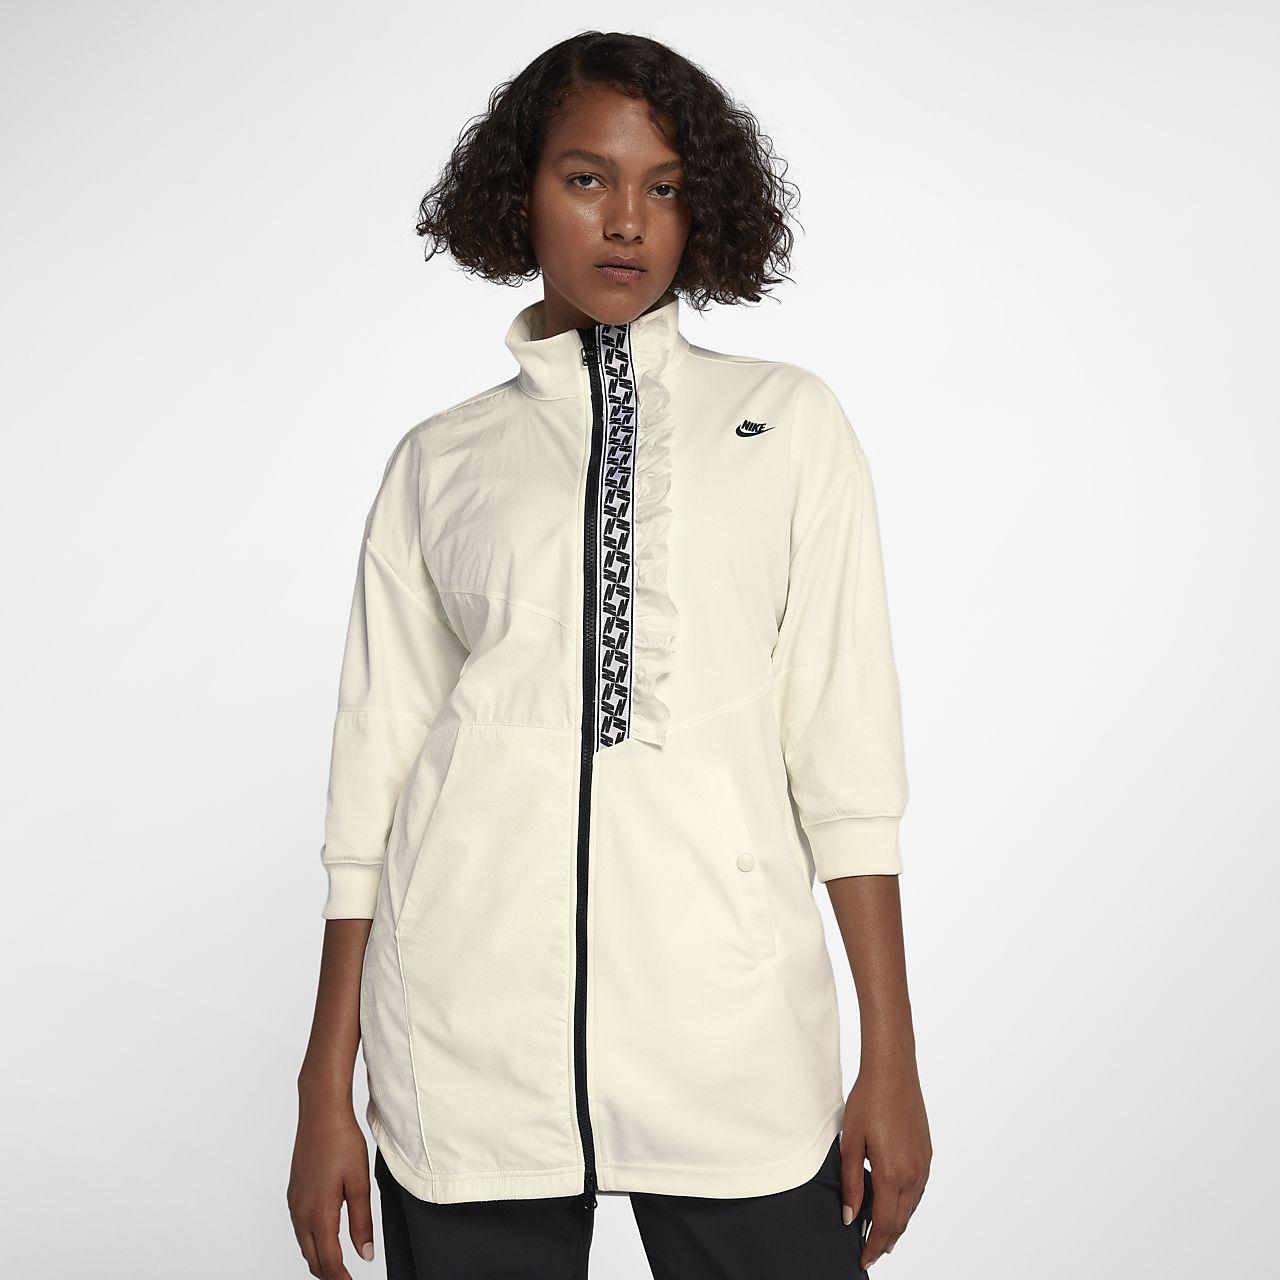 Nike Sportswear Women s Full-Zip Track Jacket. Nike.com ZA 9006a50390